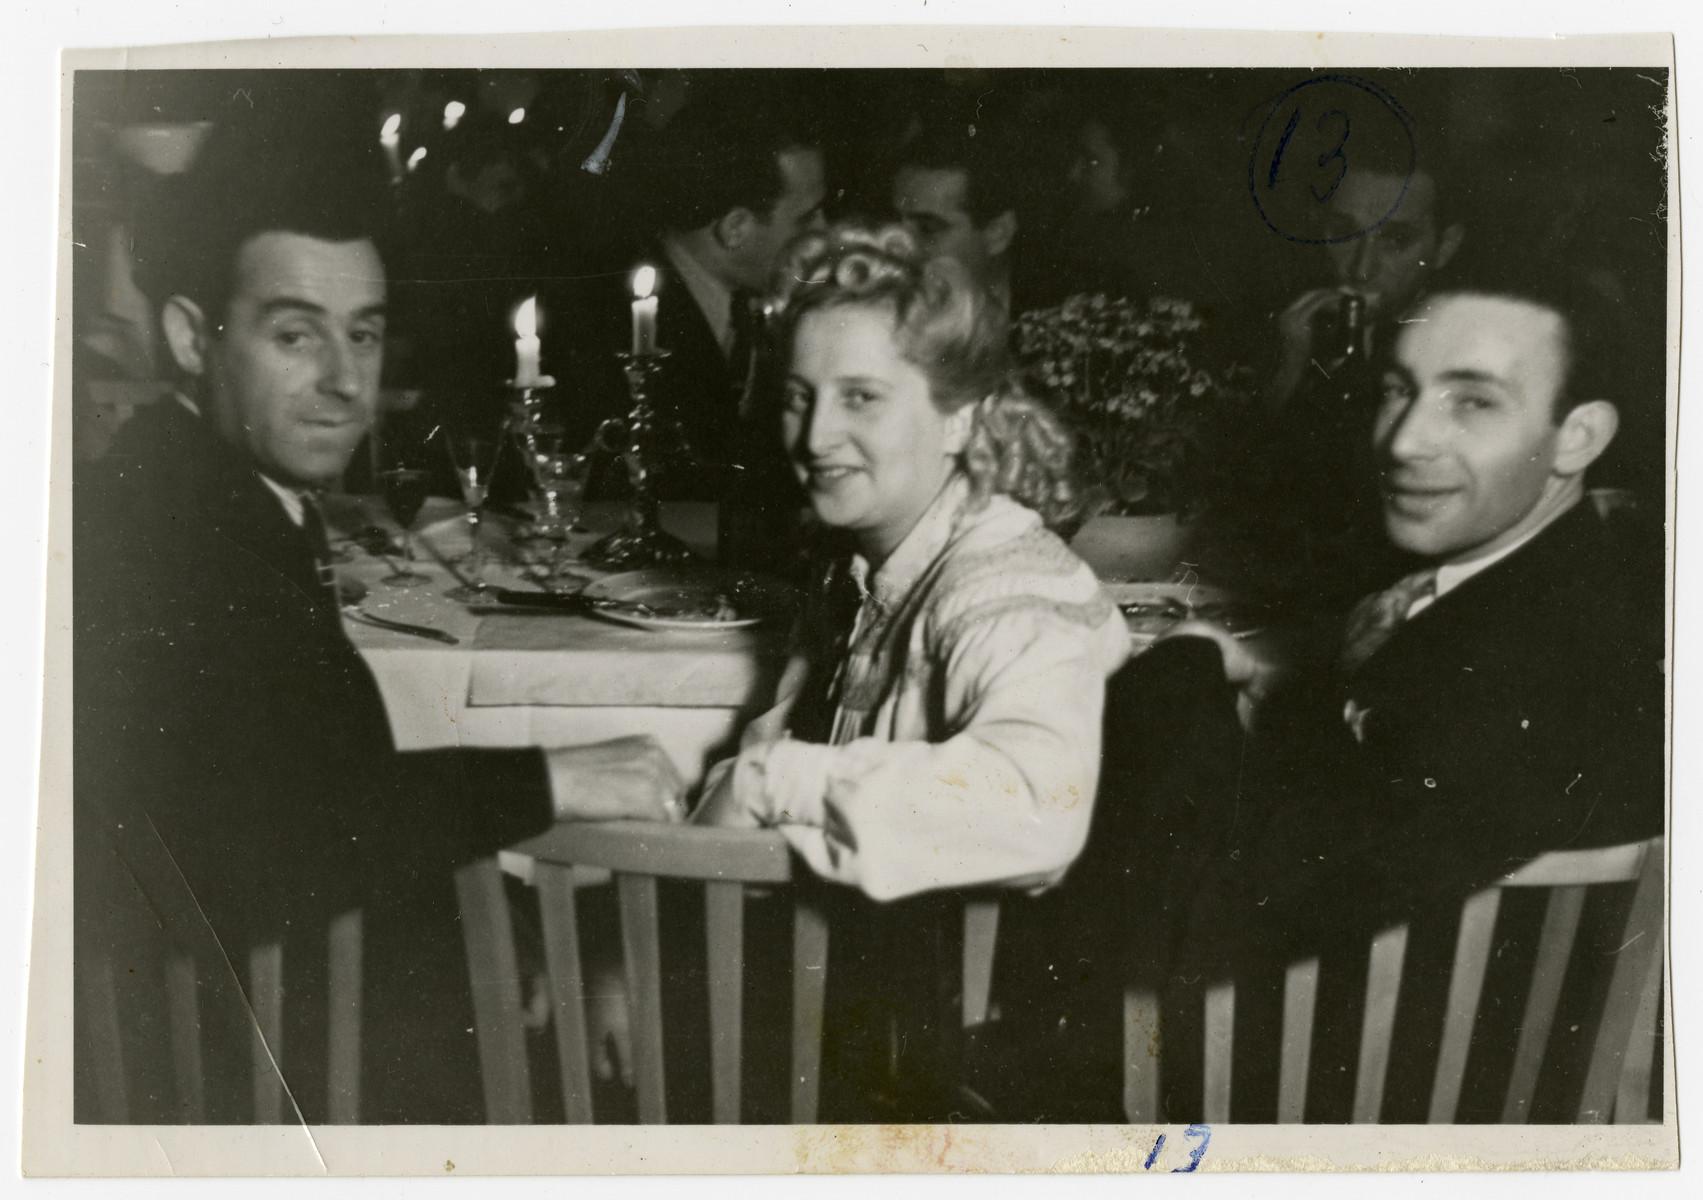 Solomon Manischewitz (left) enjoys a Shabbat dinner with his wife Sara and an unidentified friend.